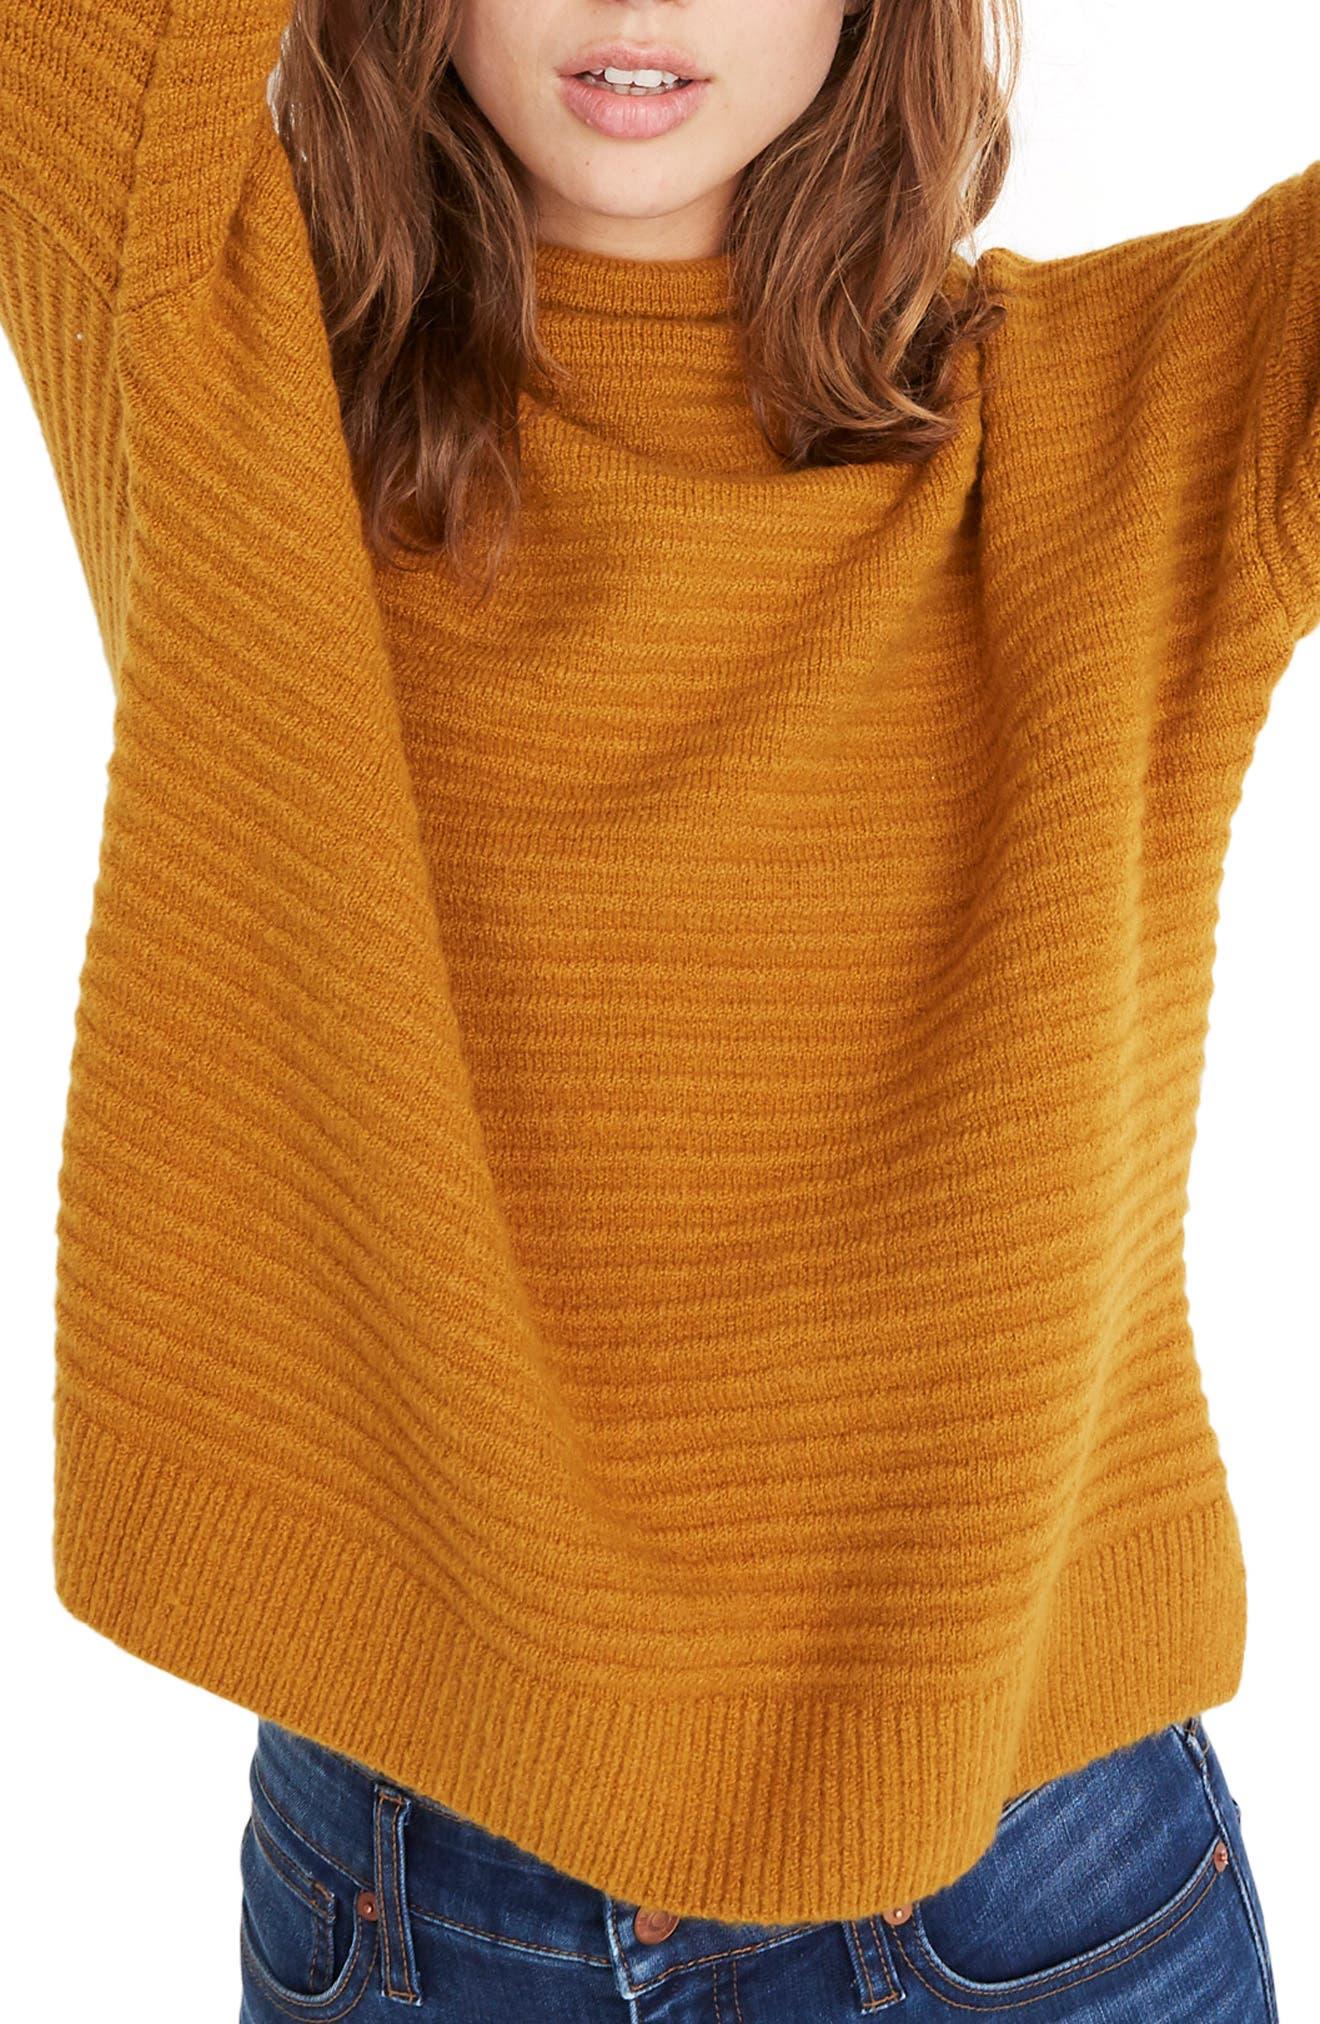 Belmont Mock Neck Sweater,                             Main thumbnail 1, color,                             GOLDEN HARVEST